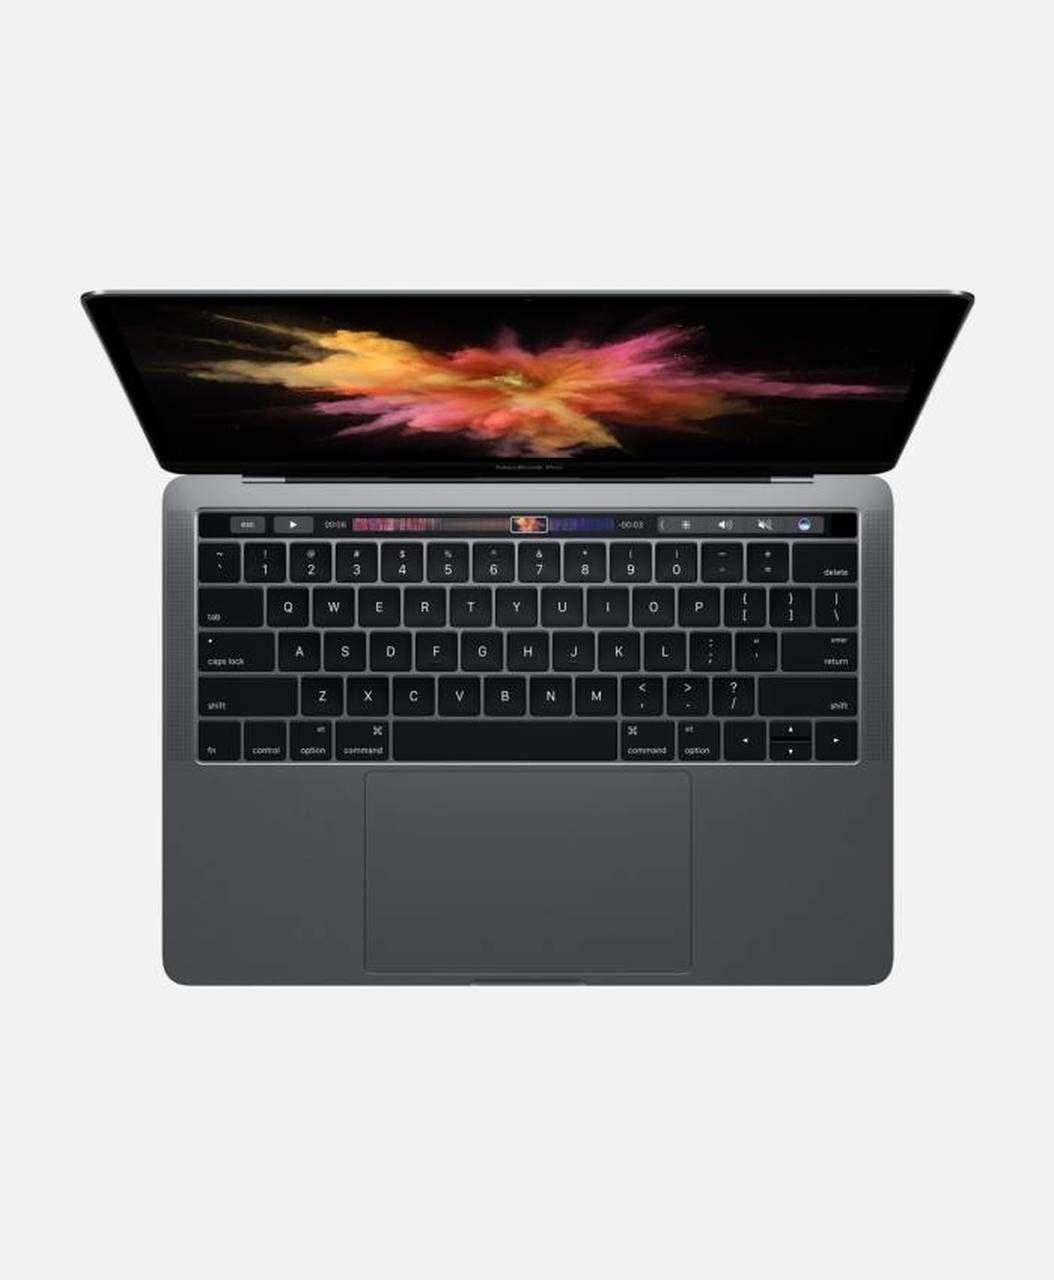 Fast Affordable Macbook Pro In 2020 Macbook Pro Used Macbook Pro Macbook